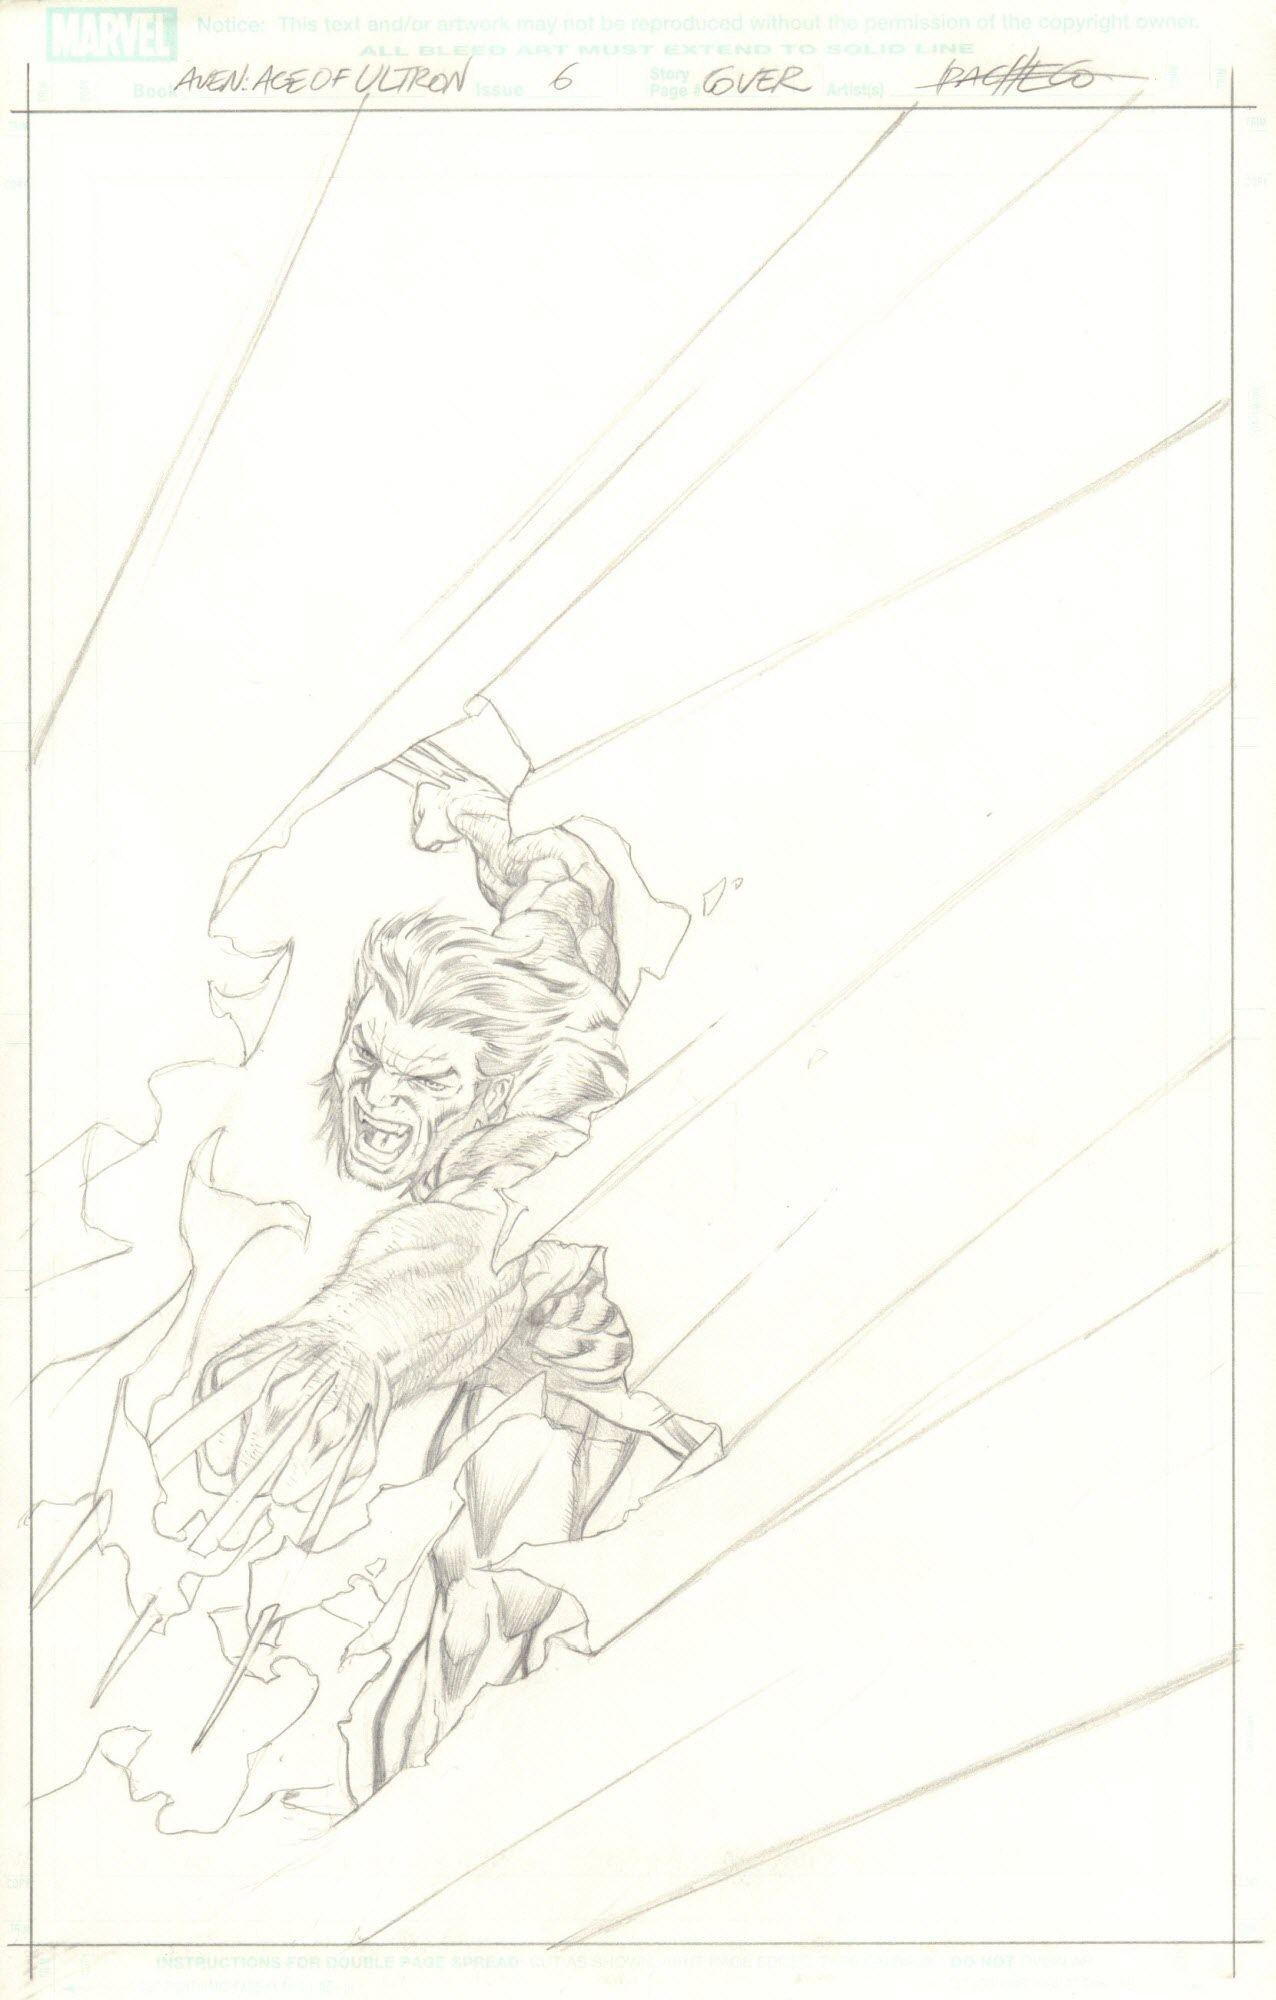 The Avengers: Age of Ultron #6 - okładka (ołówek)